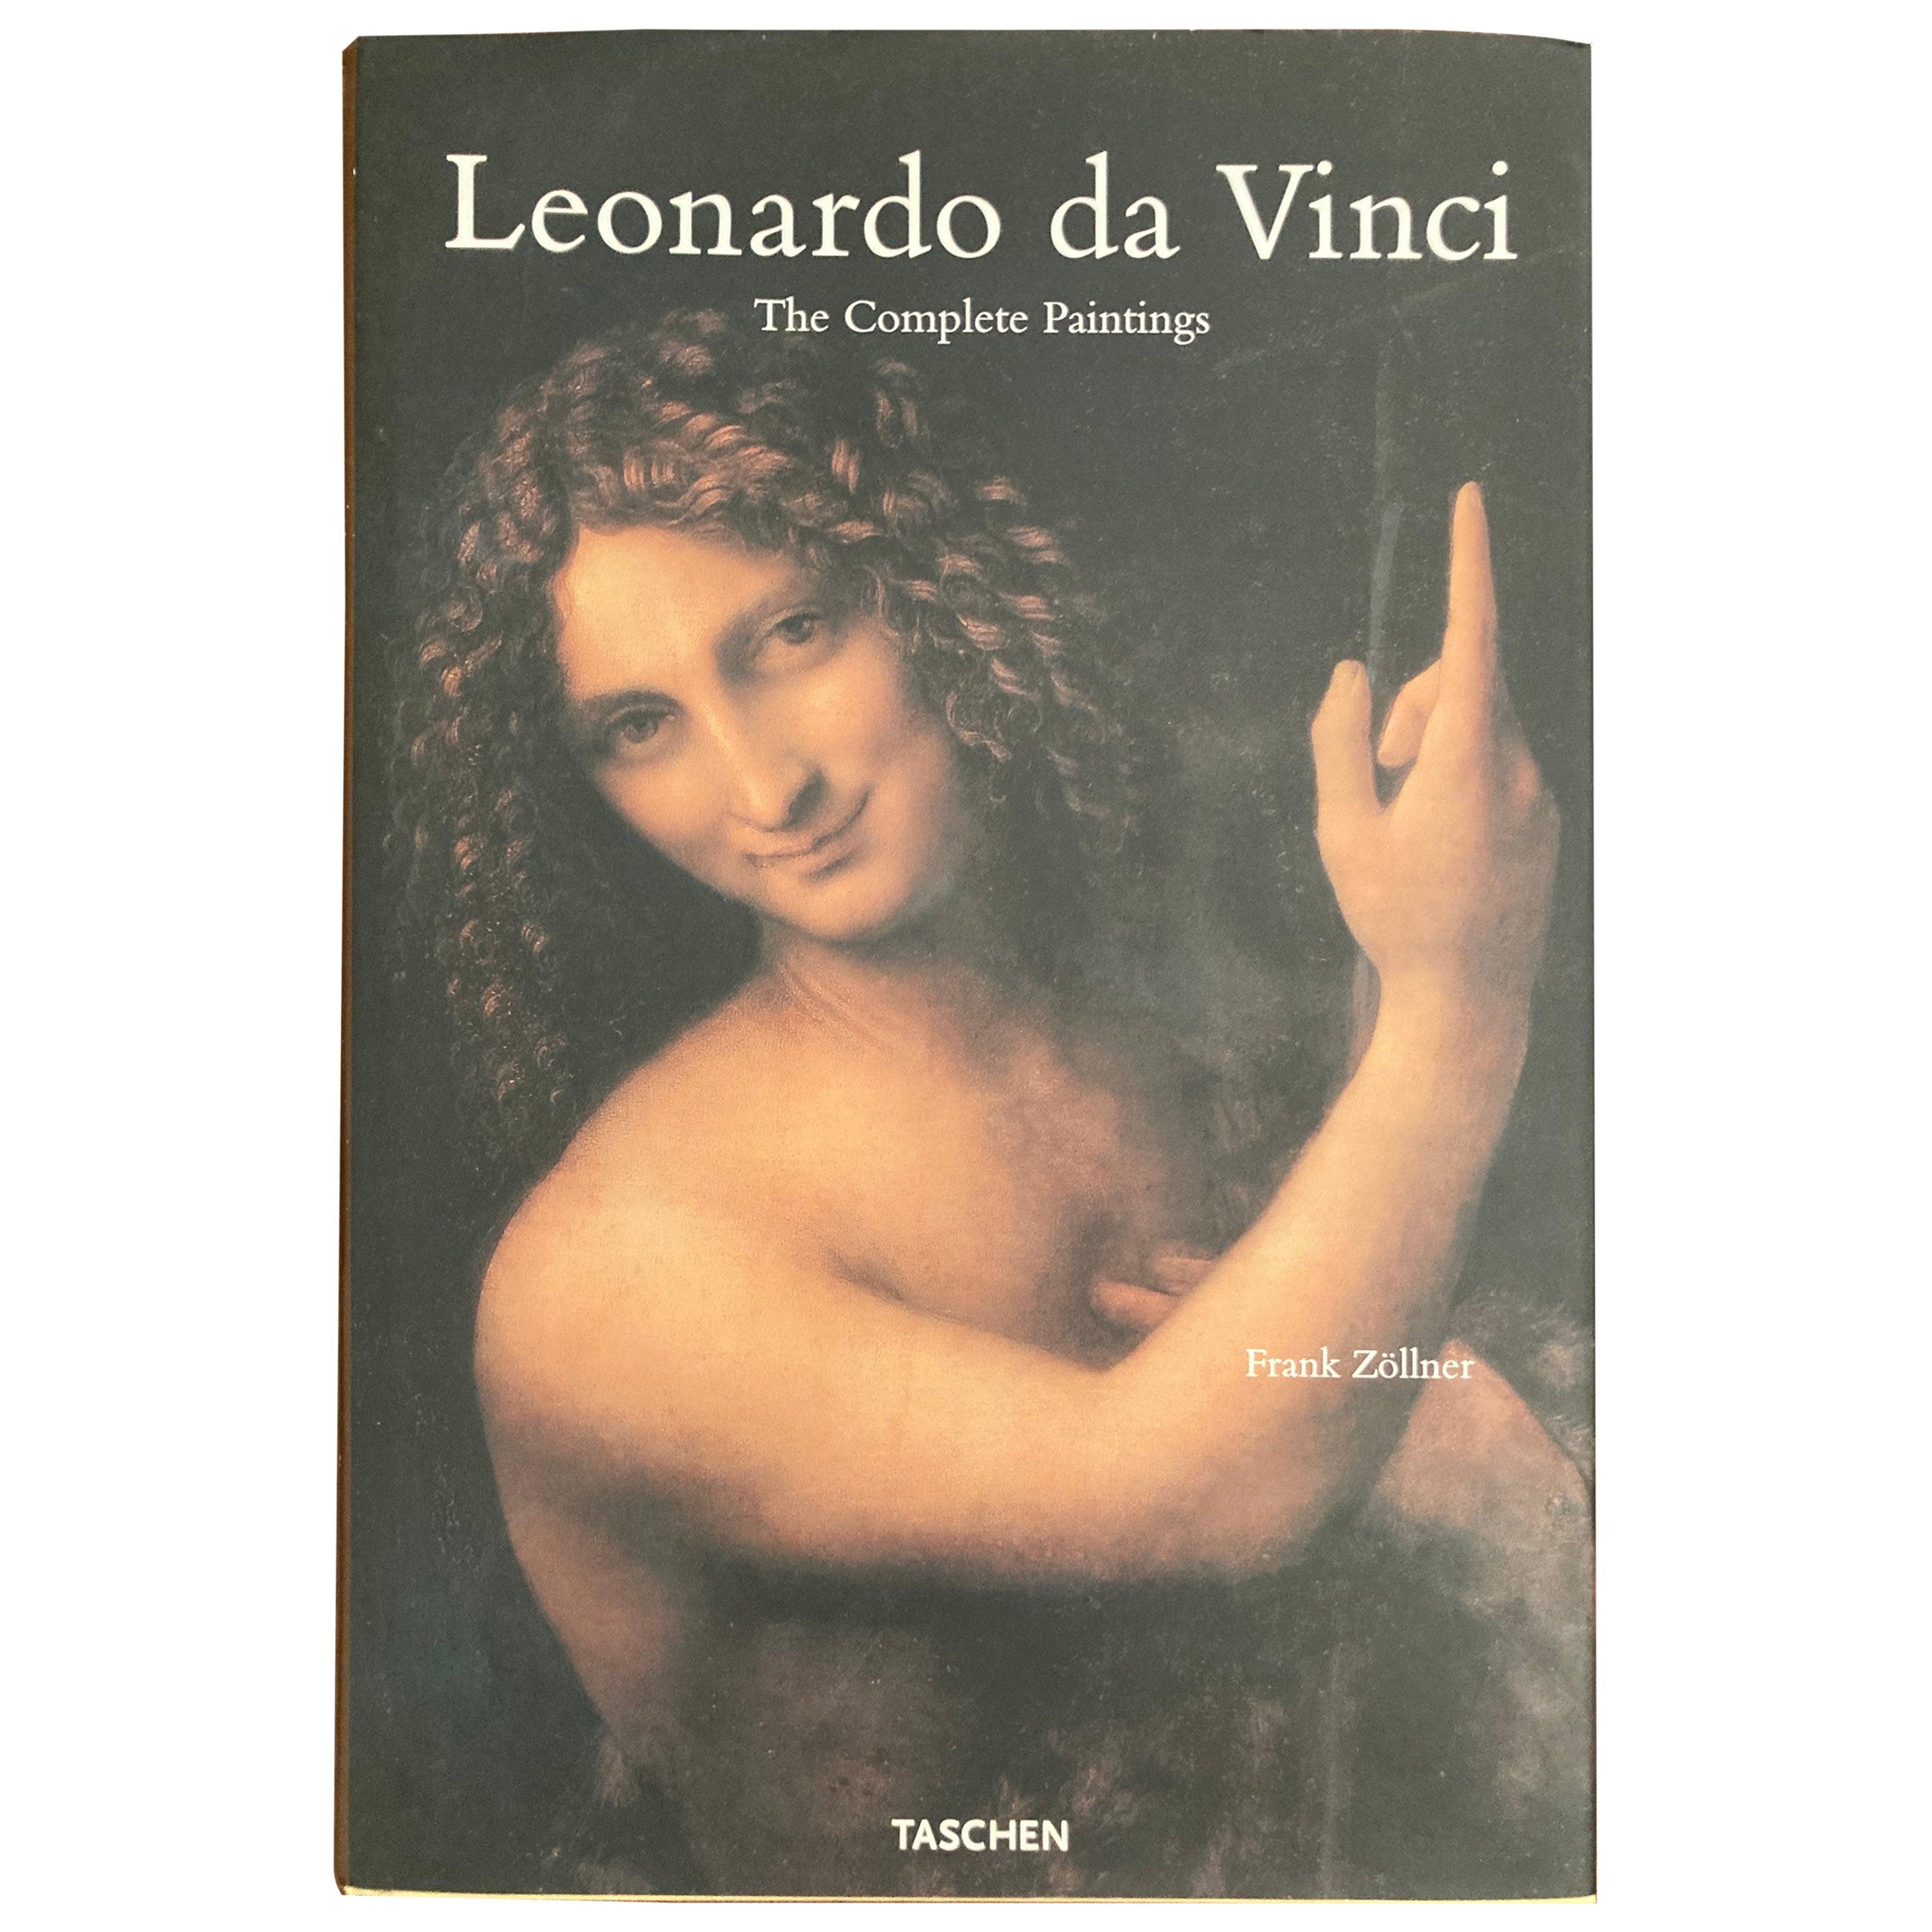 Leonardo Da Vinci The Complete Paintings, Coffee Table Art Book